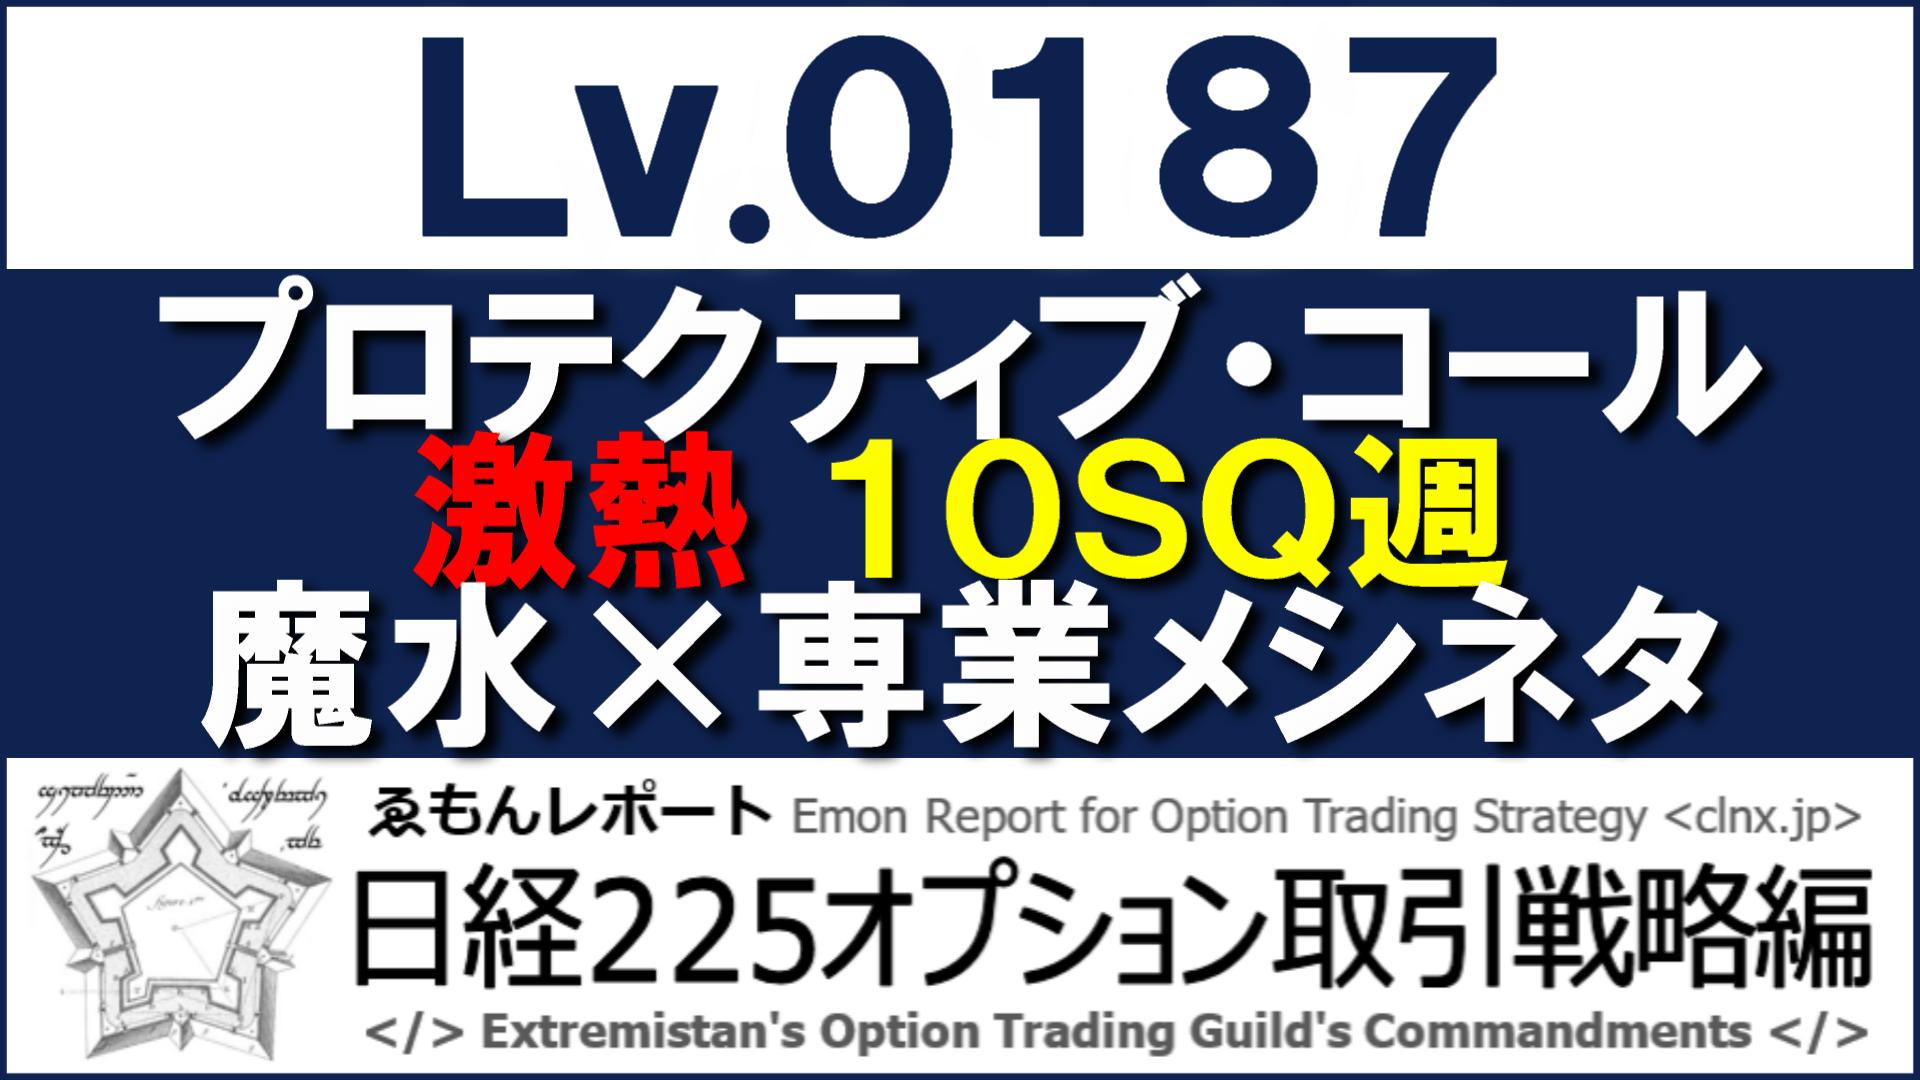 Lv0187サムネ